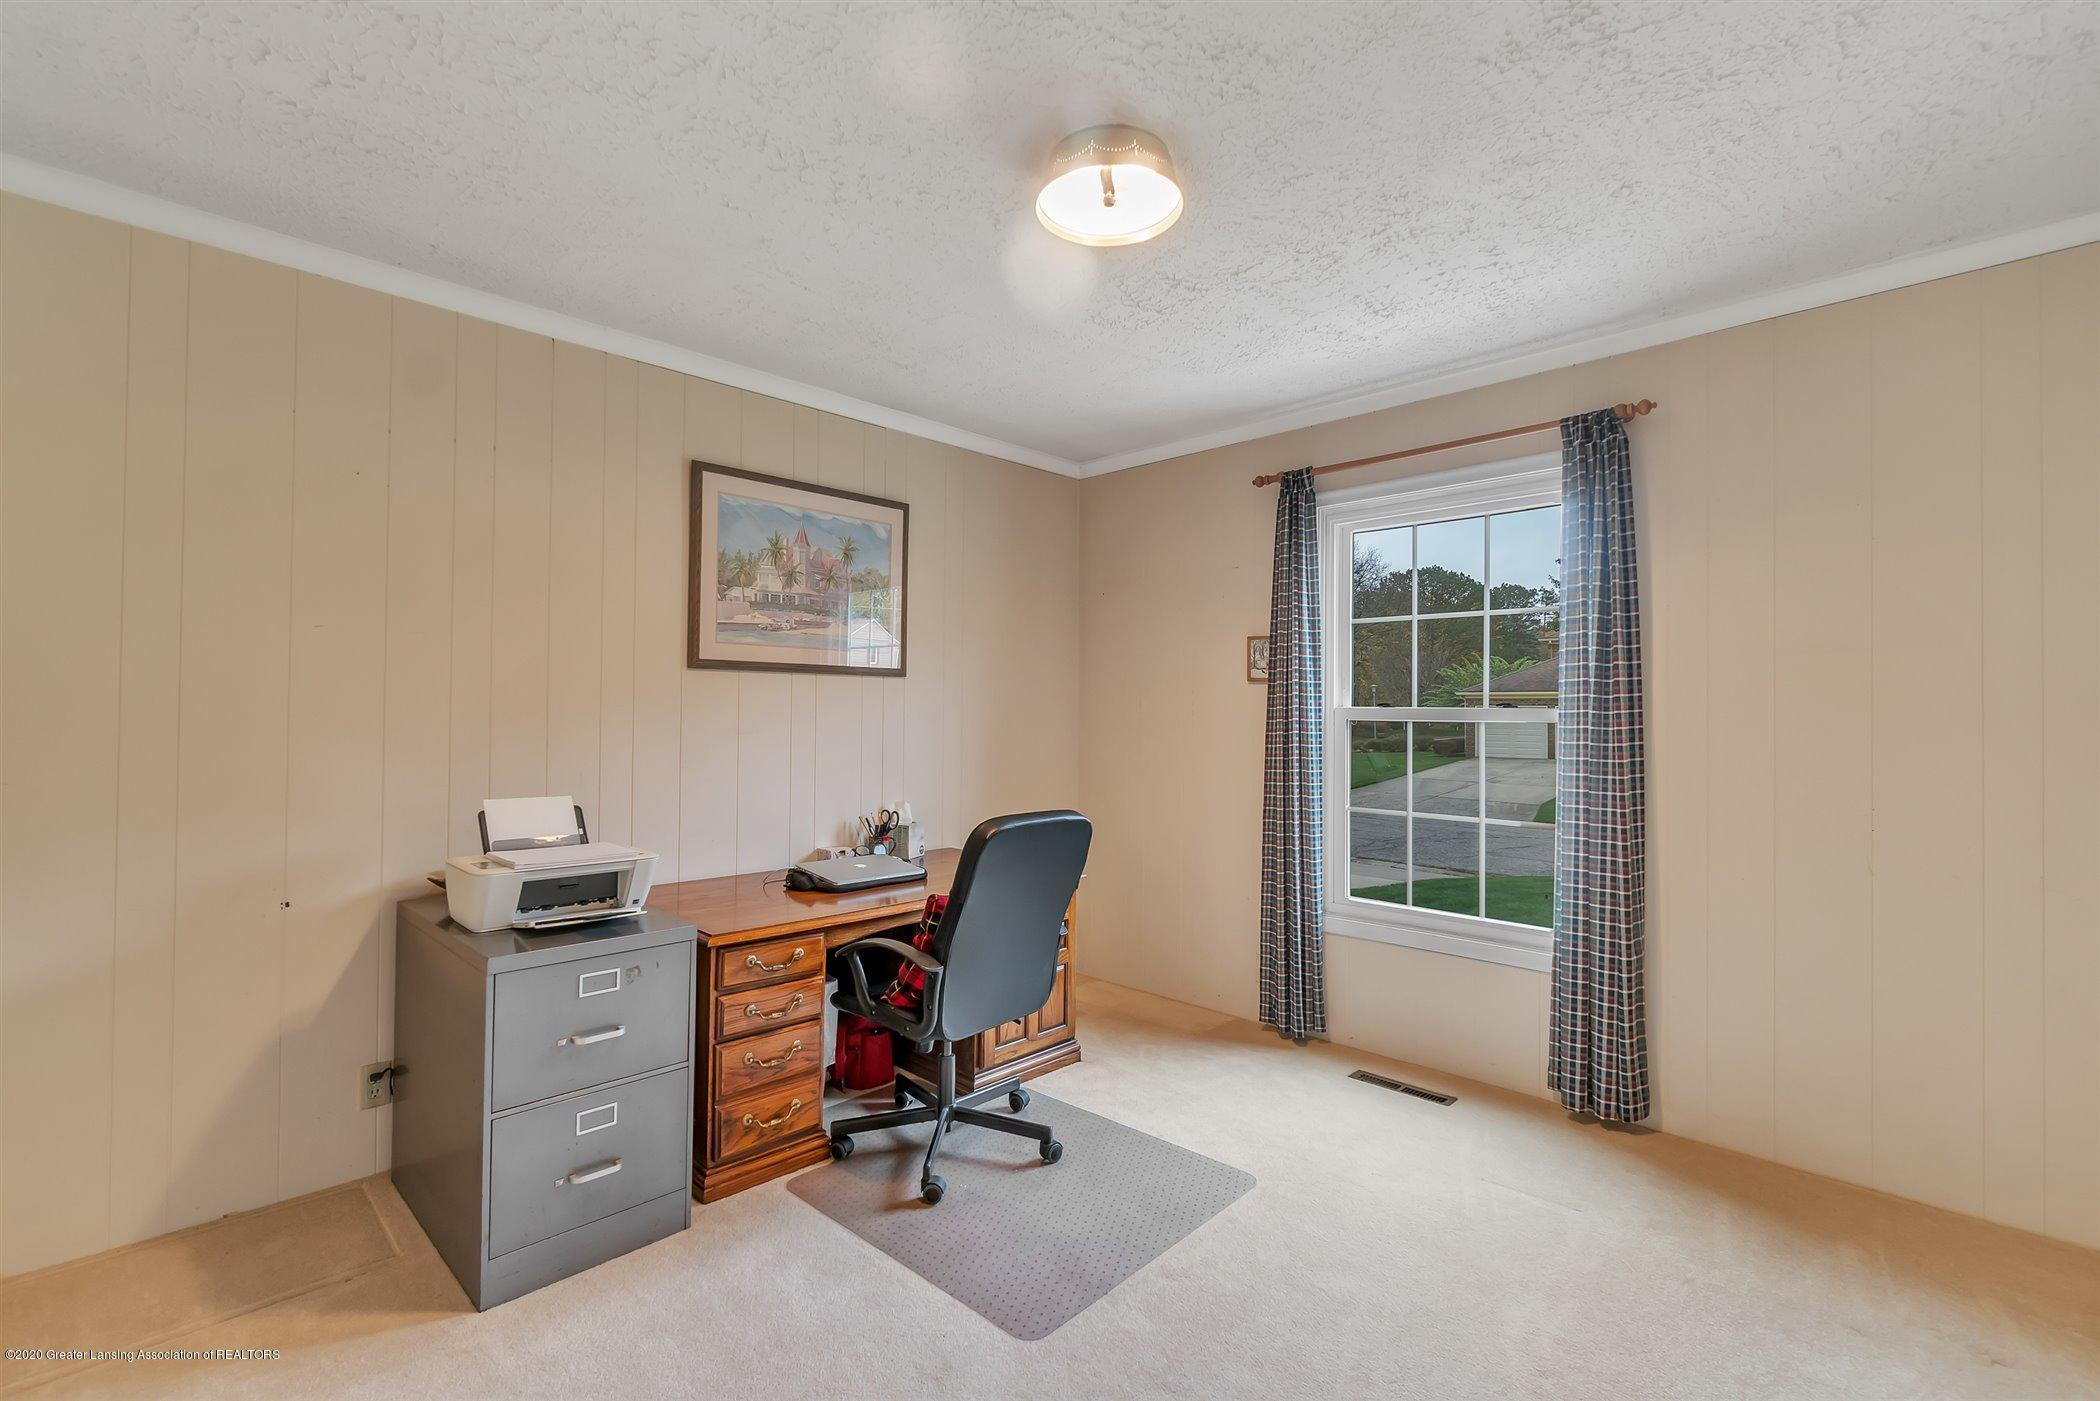 2098 Butternut Dr - first floor den or possible bedroom - 21